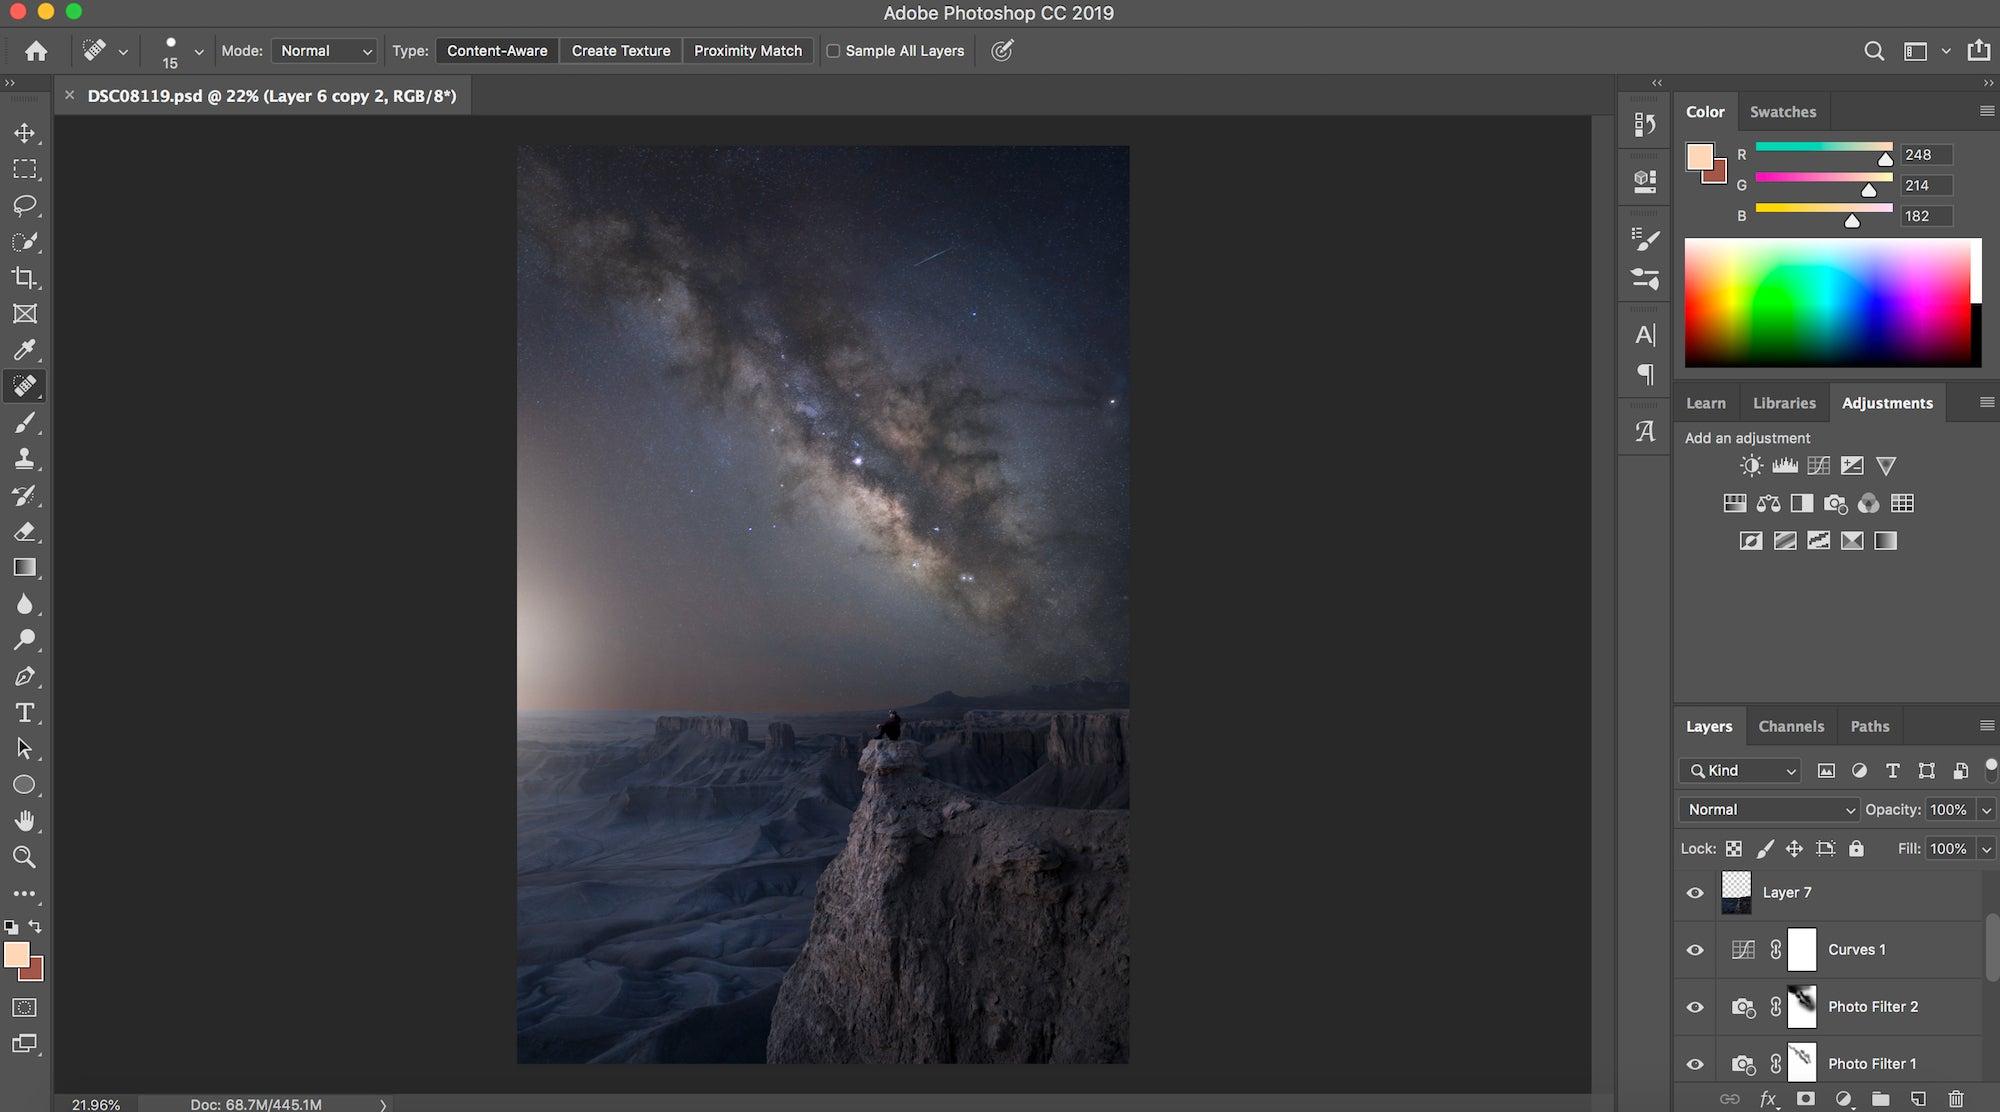 Alpha-Universe-BTS-David-Frietz-Photoshop-1.jpg